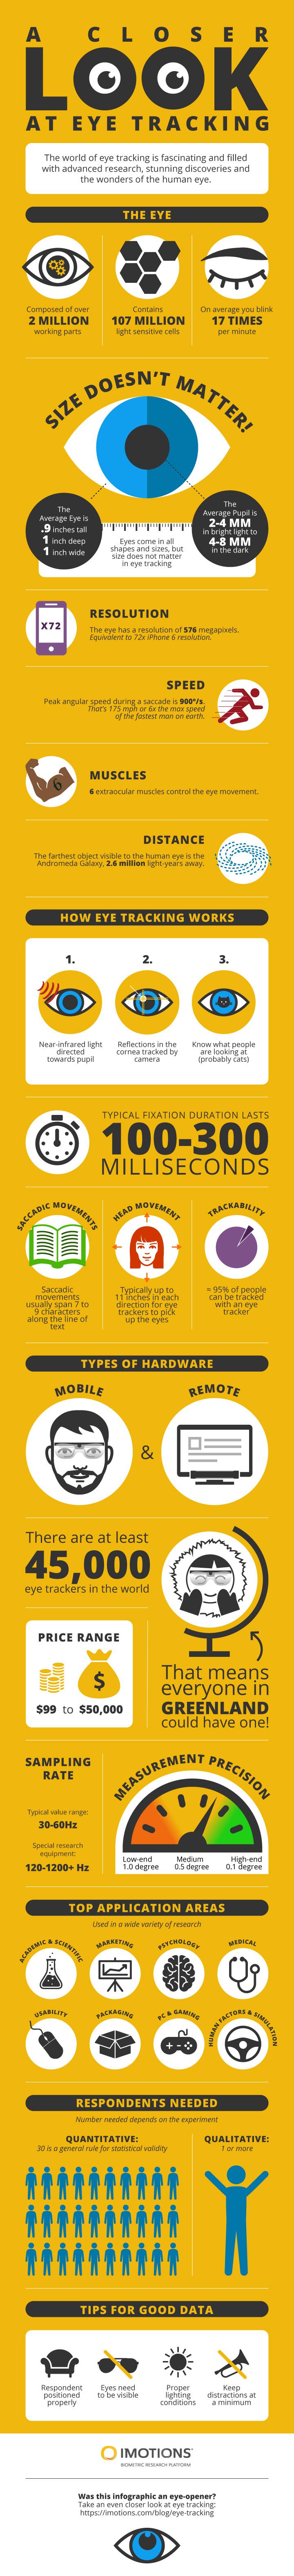 eye tracking infographic